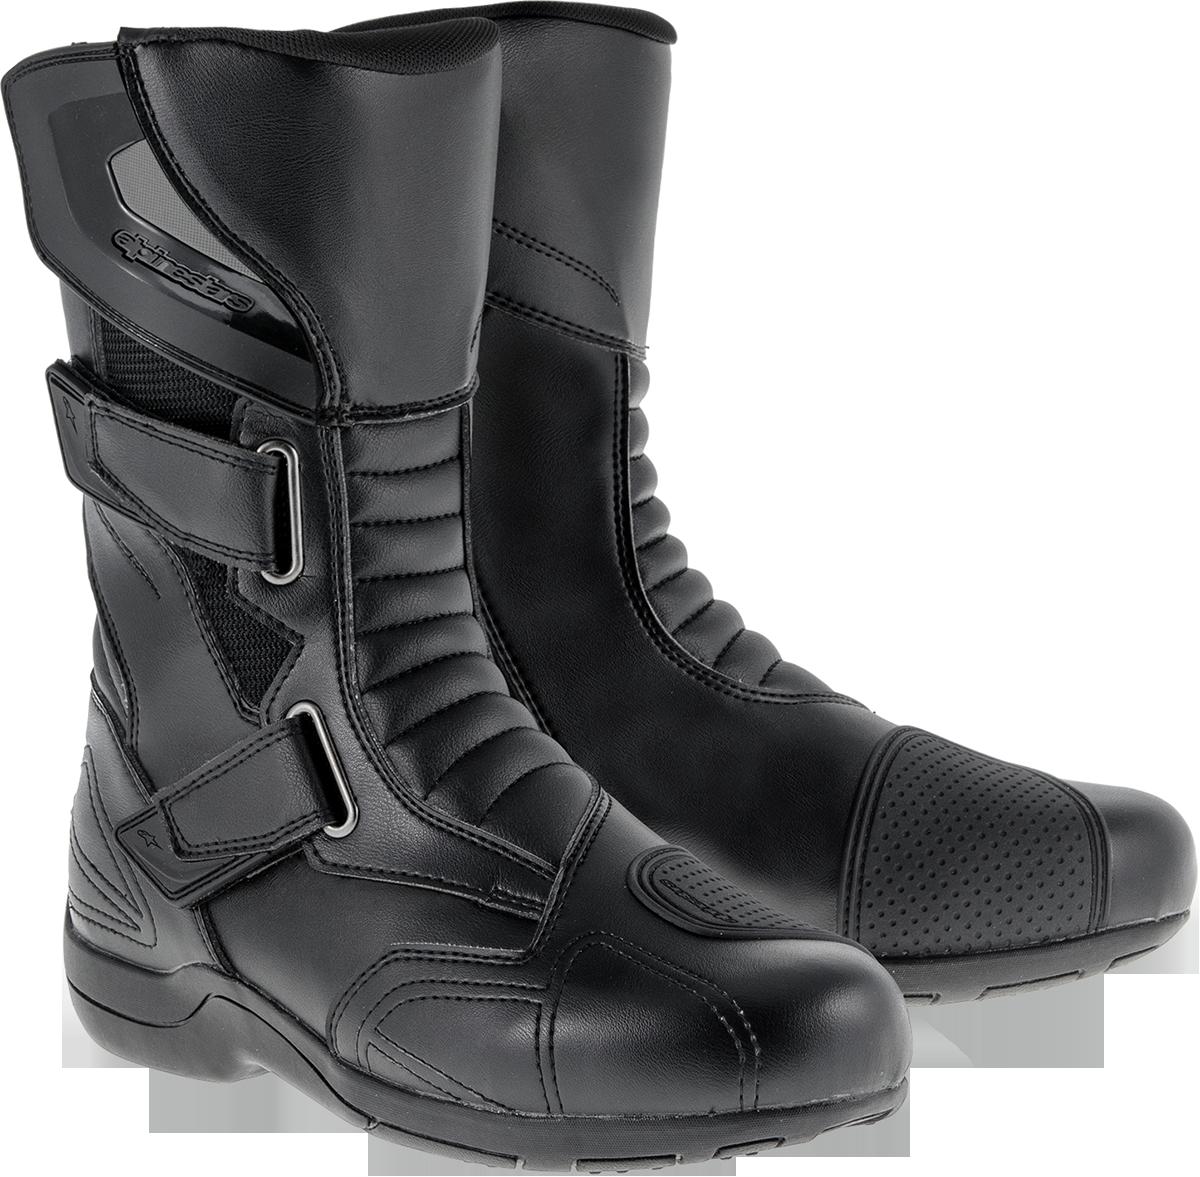 Alpinestars Mens Black Roam 2 Motorcycle Riding Dual Sport Street Size 8 Boots